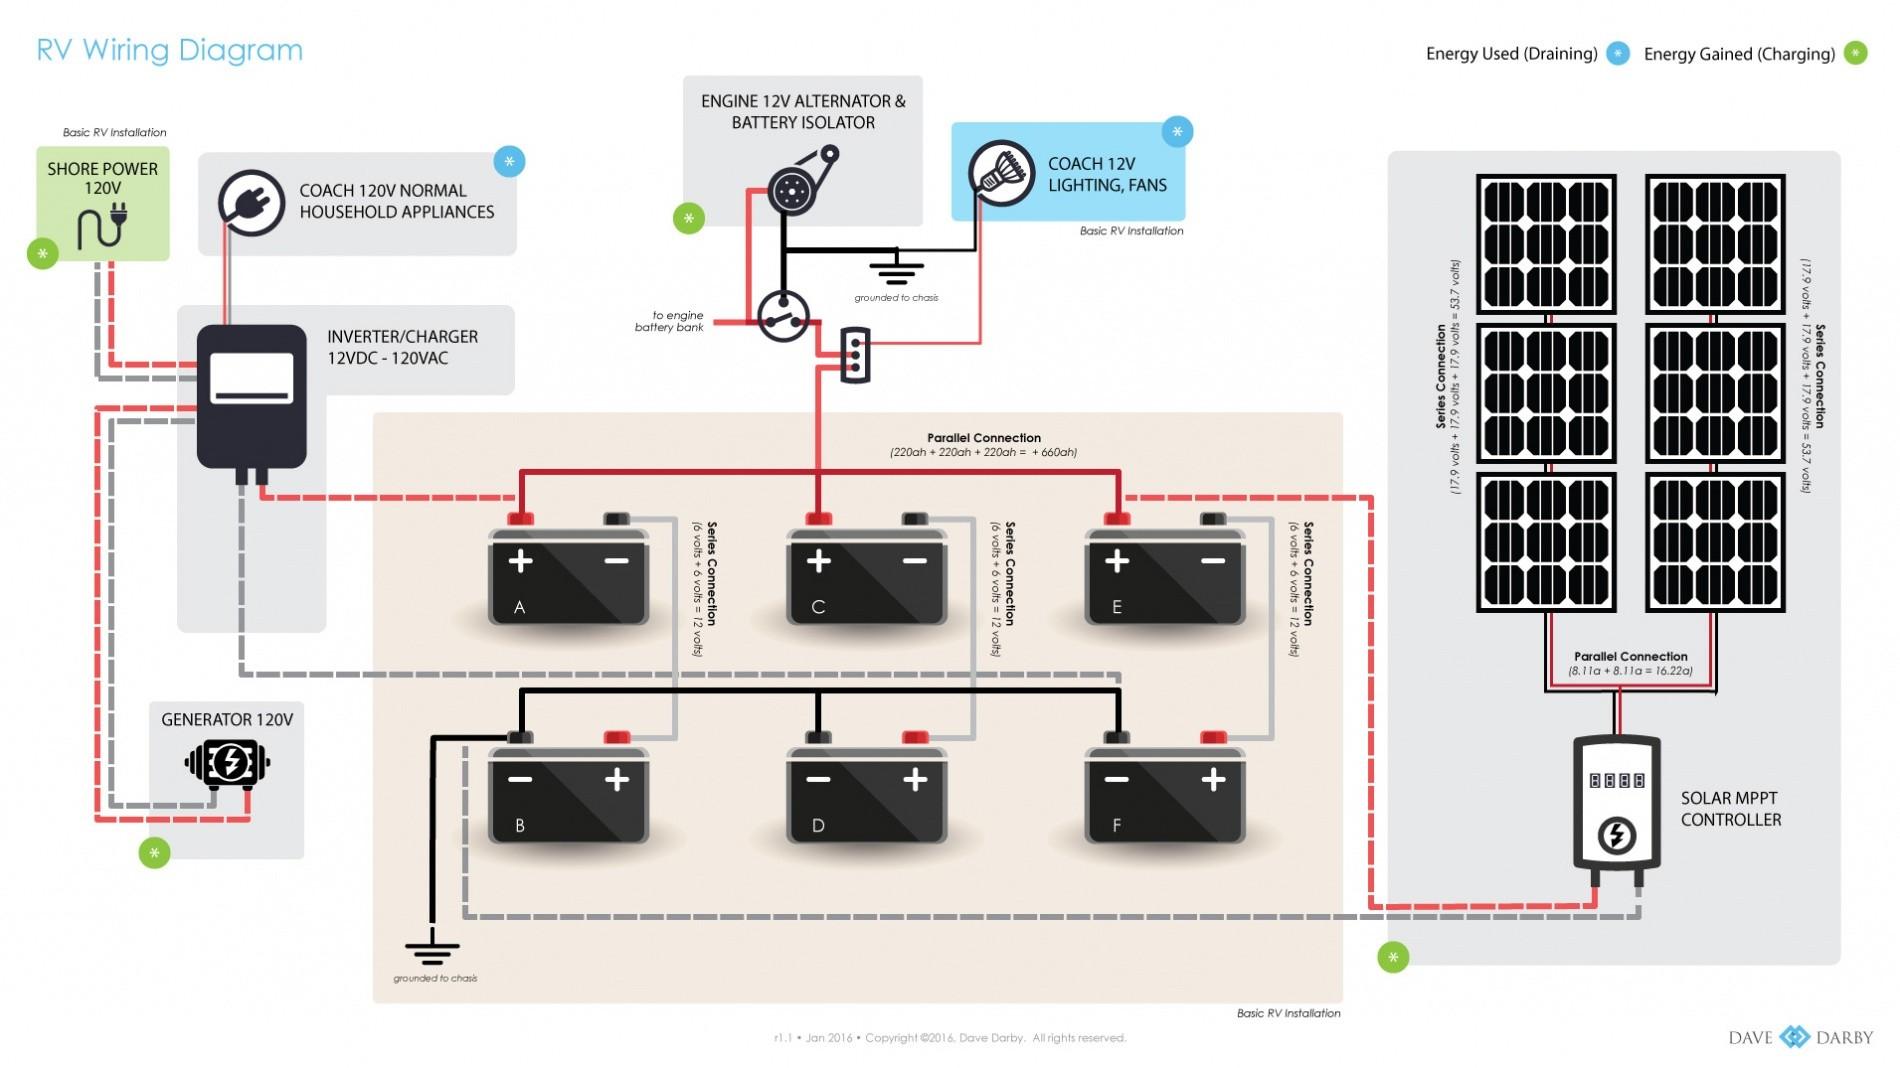 Rv solar panel wiring info wiring led solar panel wire diagram wiring diagram rh cleanprosperity co rv solar panel wiring size requirements ccuart Gallery